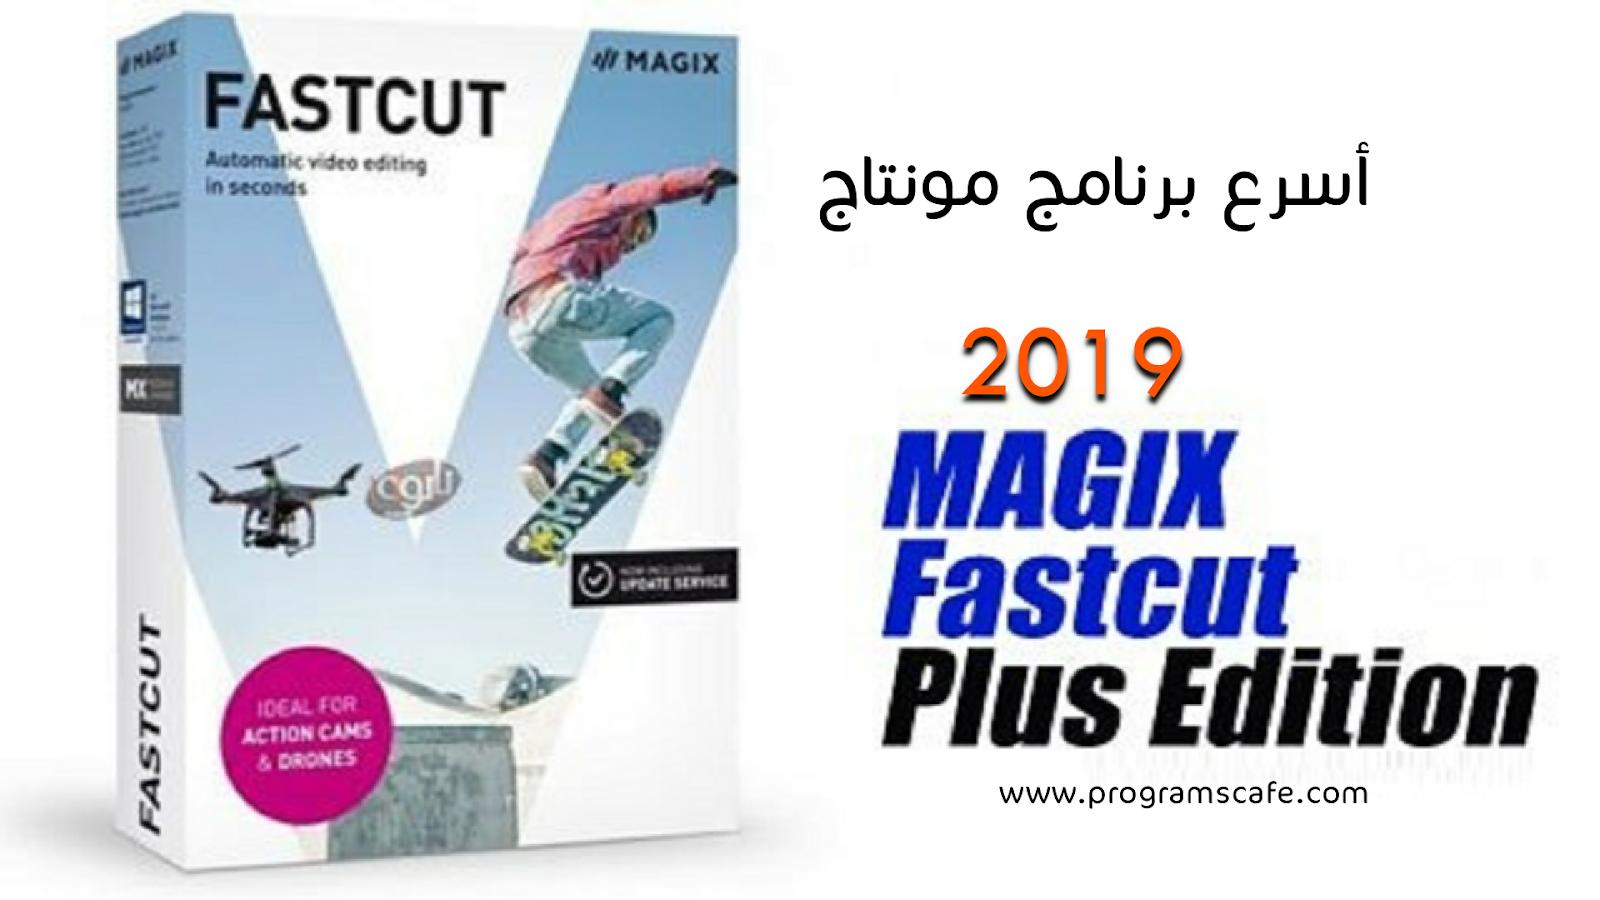 magix fastcut plus edition download